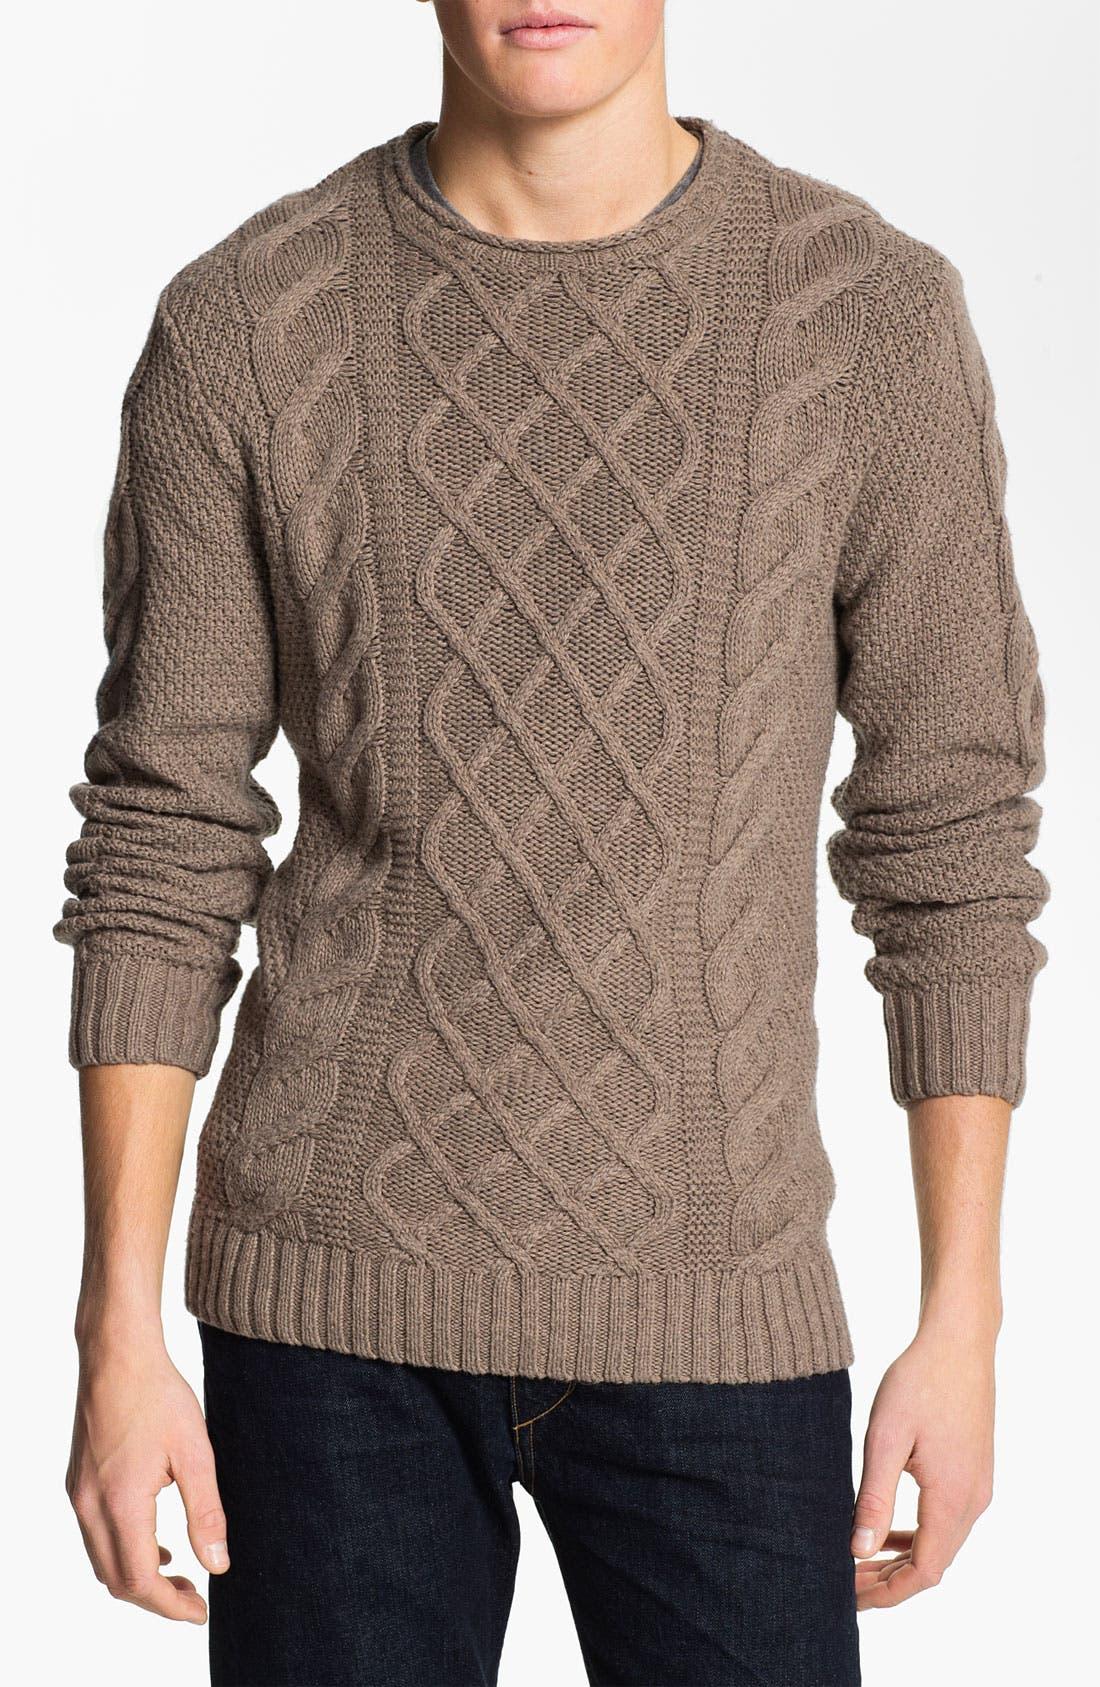 Main Image - Original Penguin Cable Knit Sweater